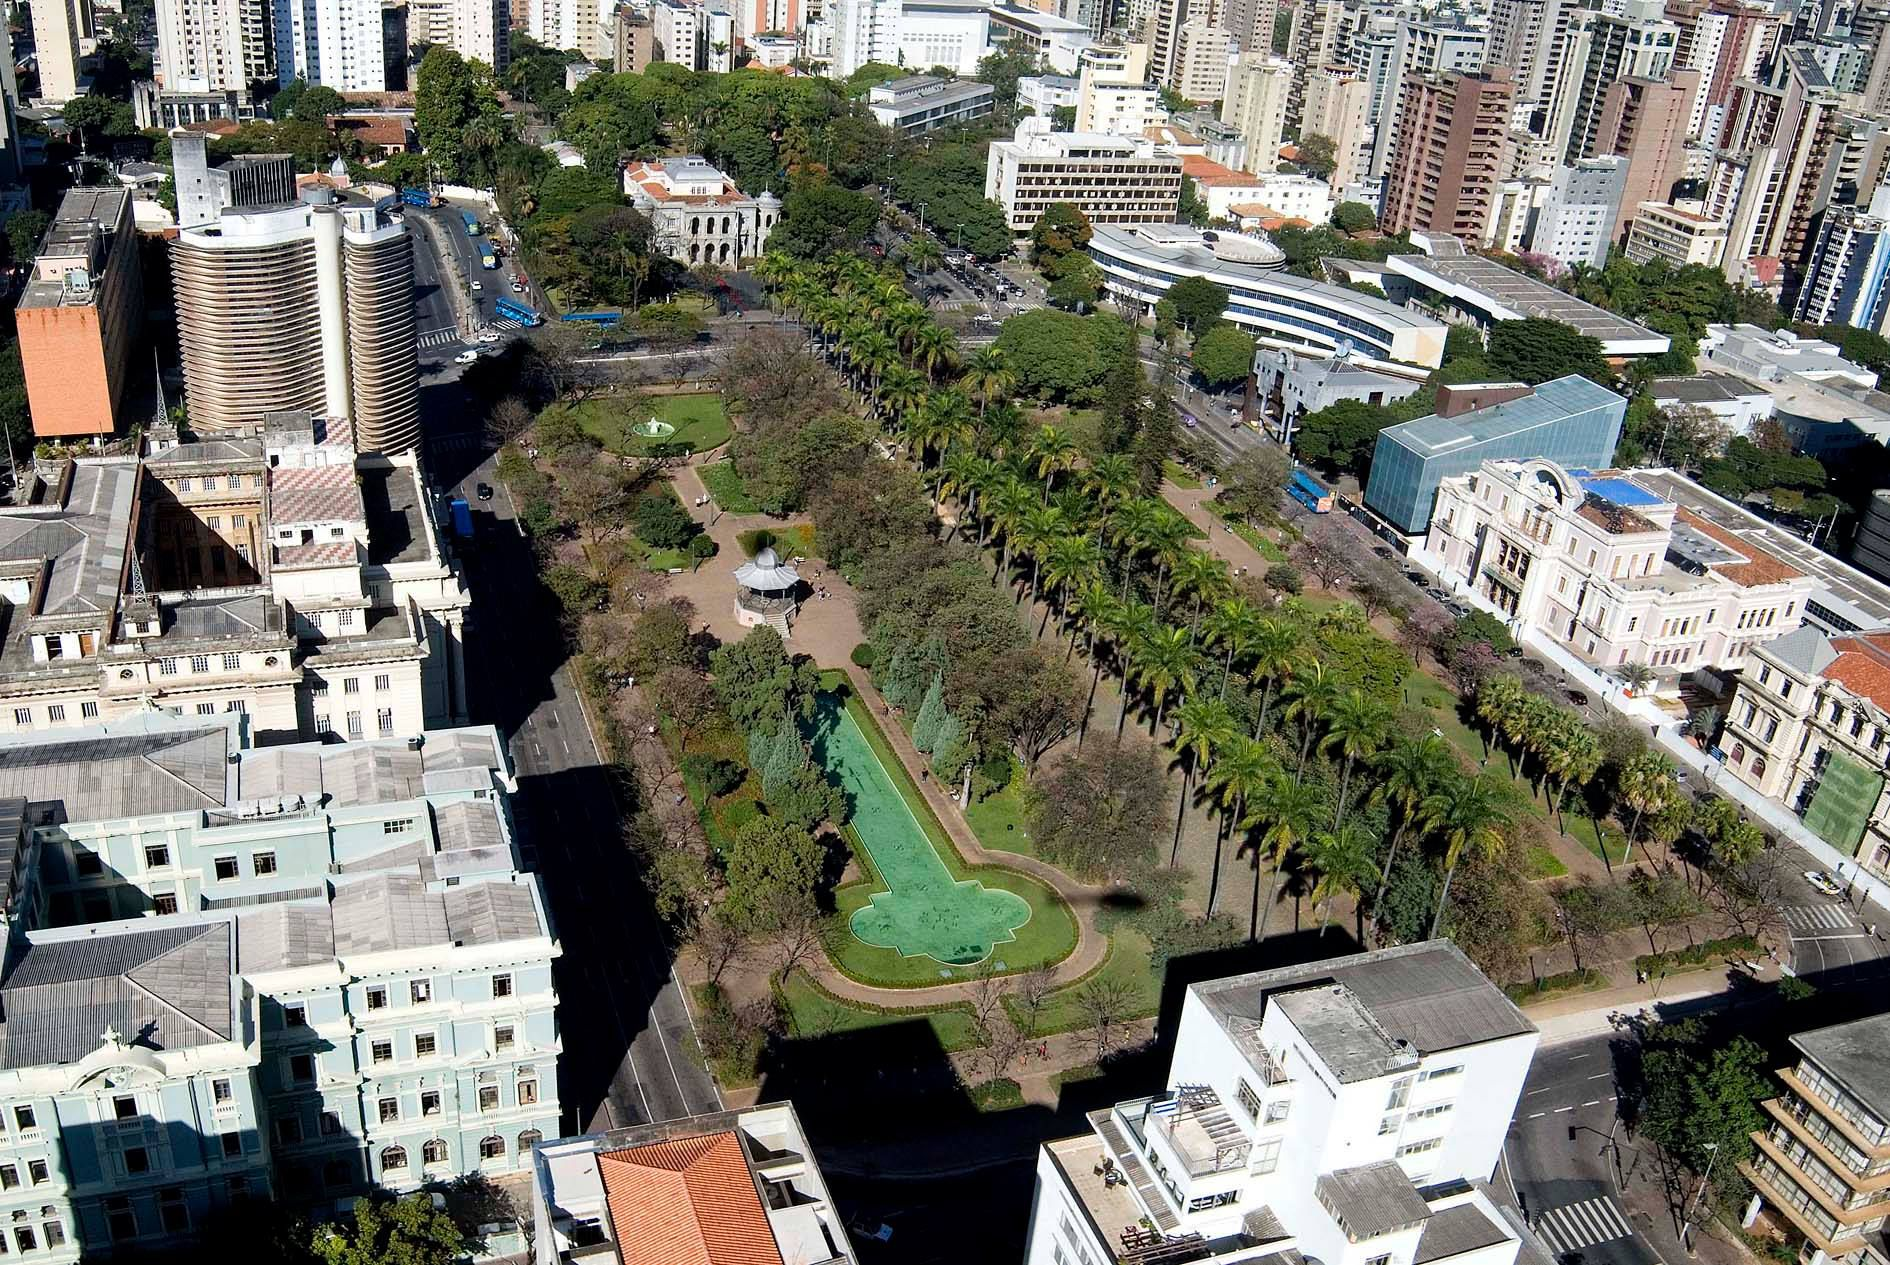 Praça da Liberdade, in Belo Horizonte